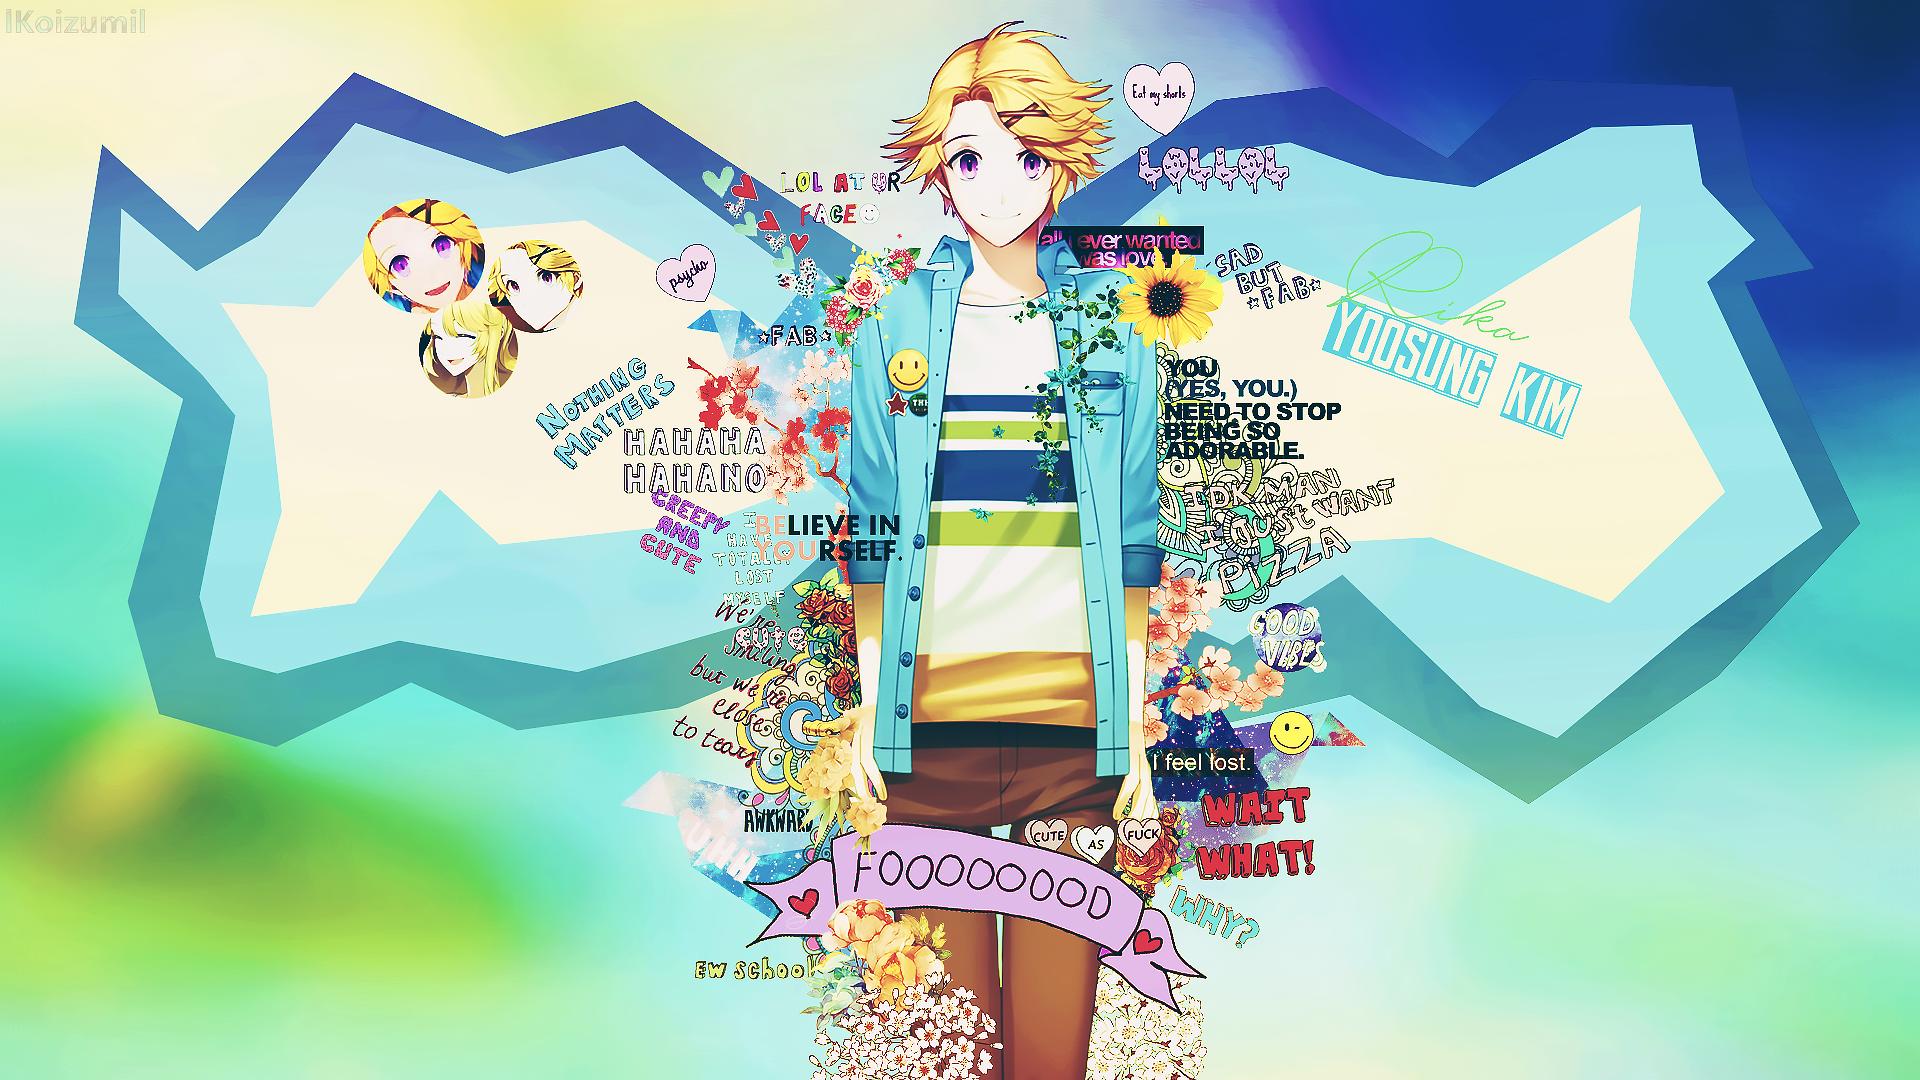 Wallpaper [ Yoosung Kim ] Mystic Messenger by lKoizumil